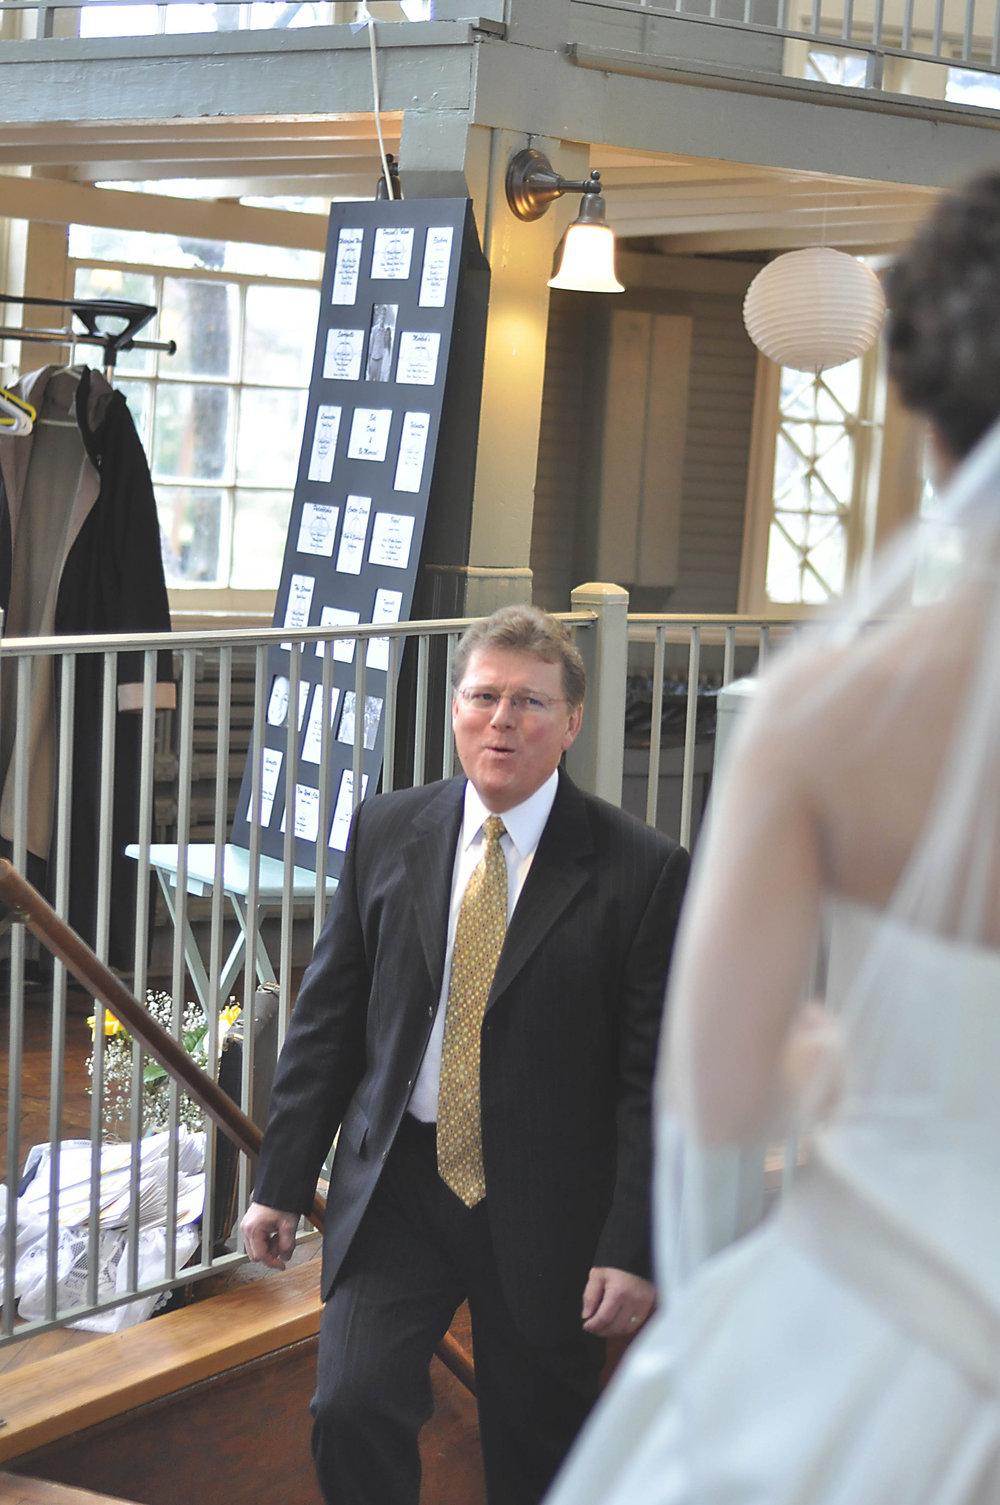 Johnson Wedding-Johnson edits-0079.jpg